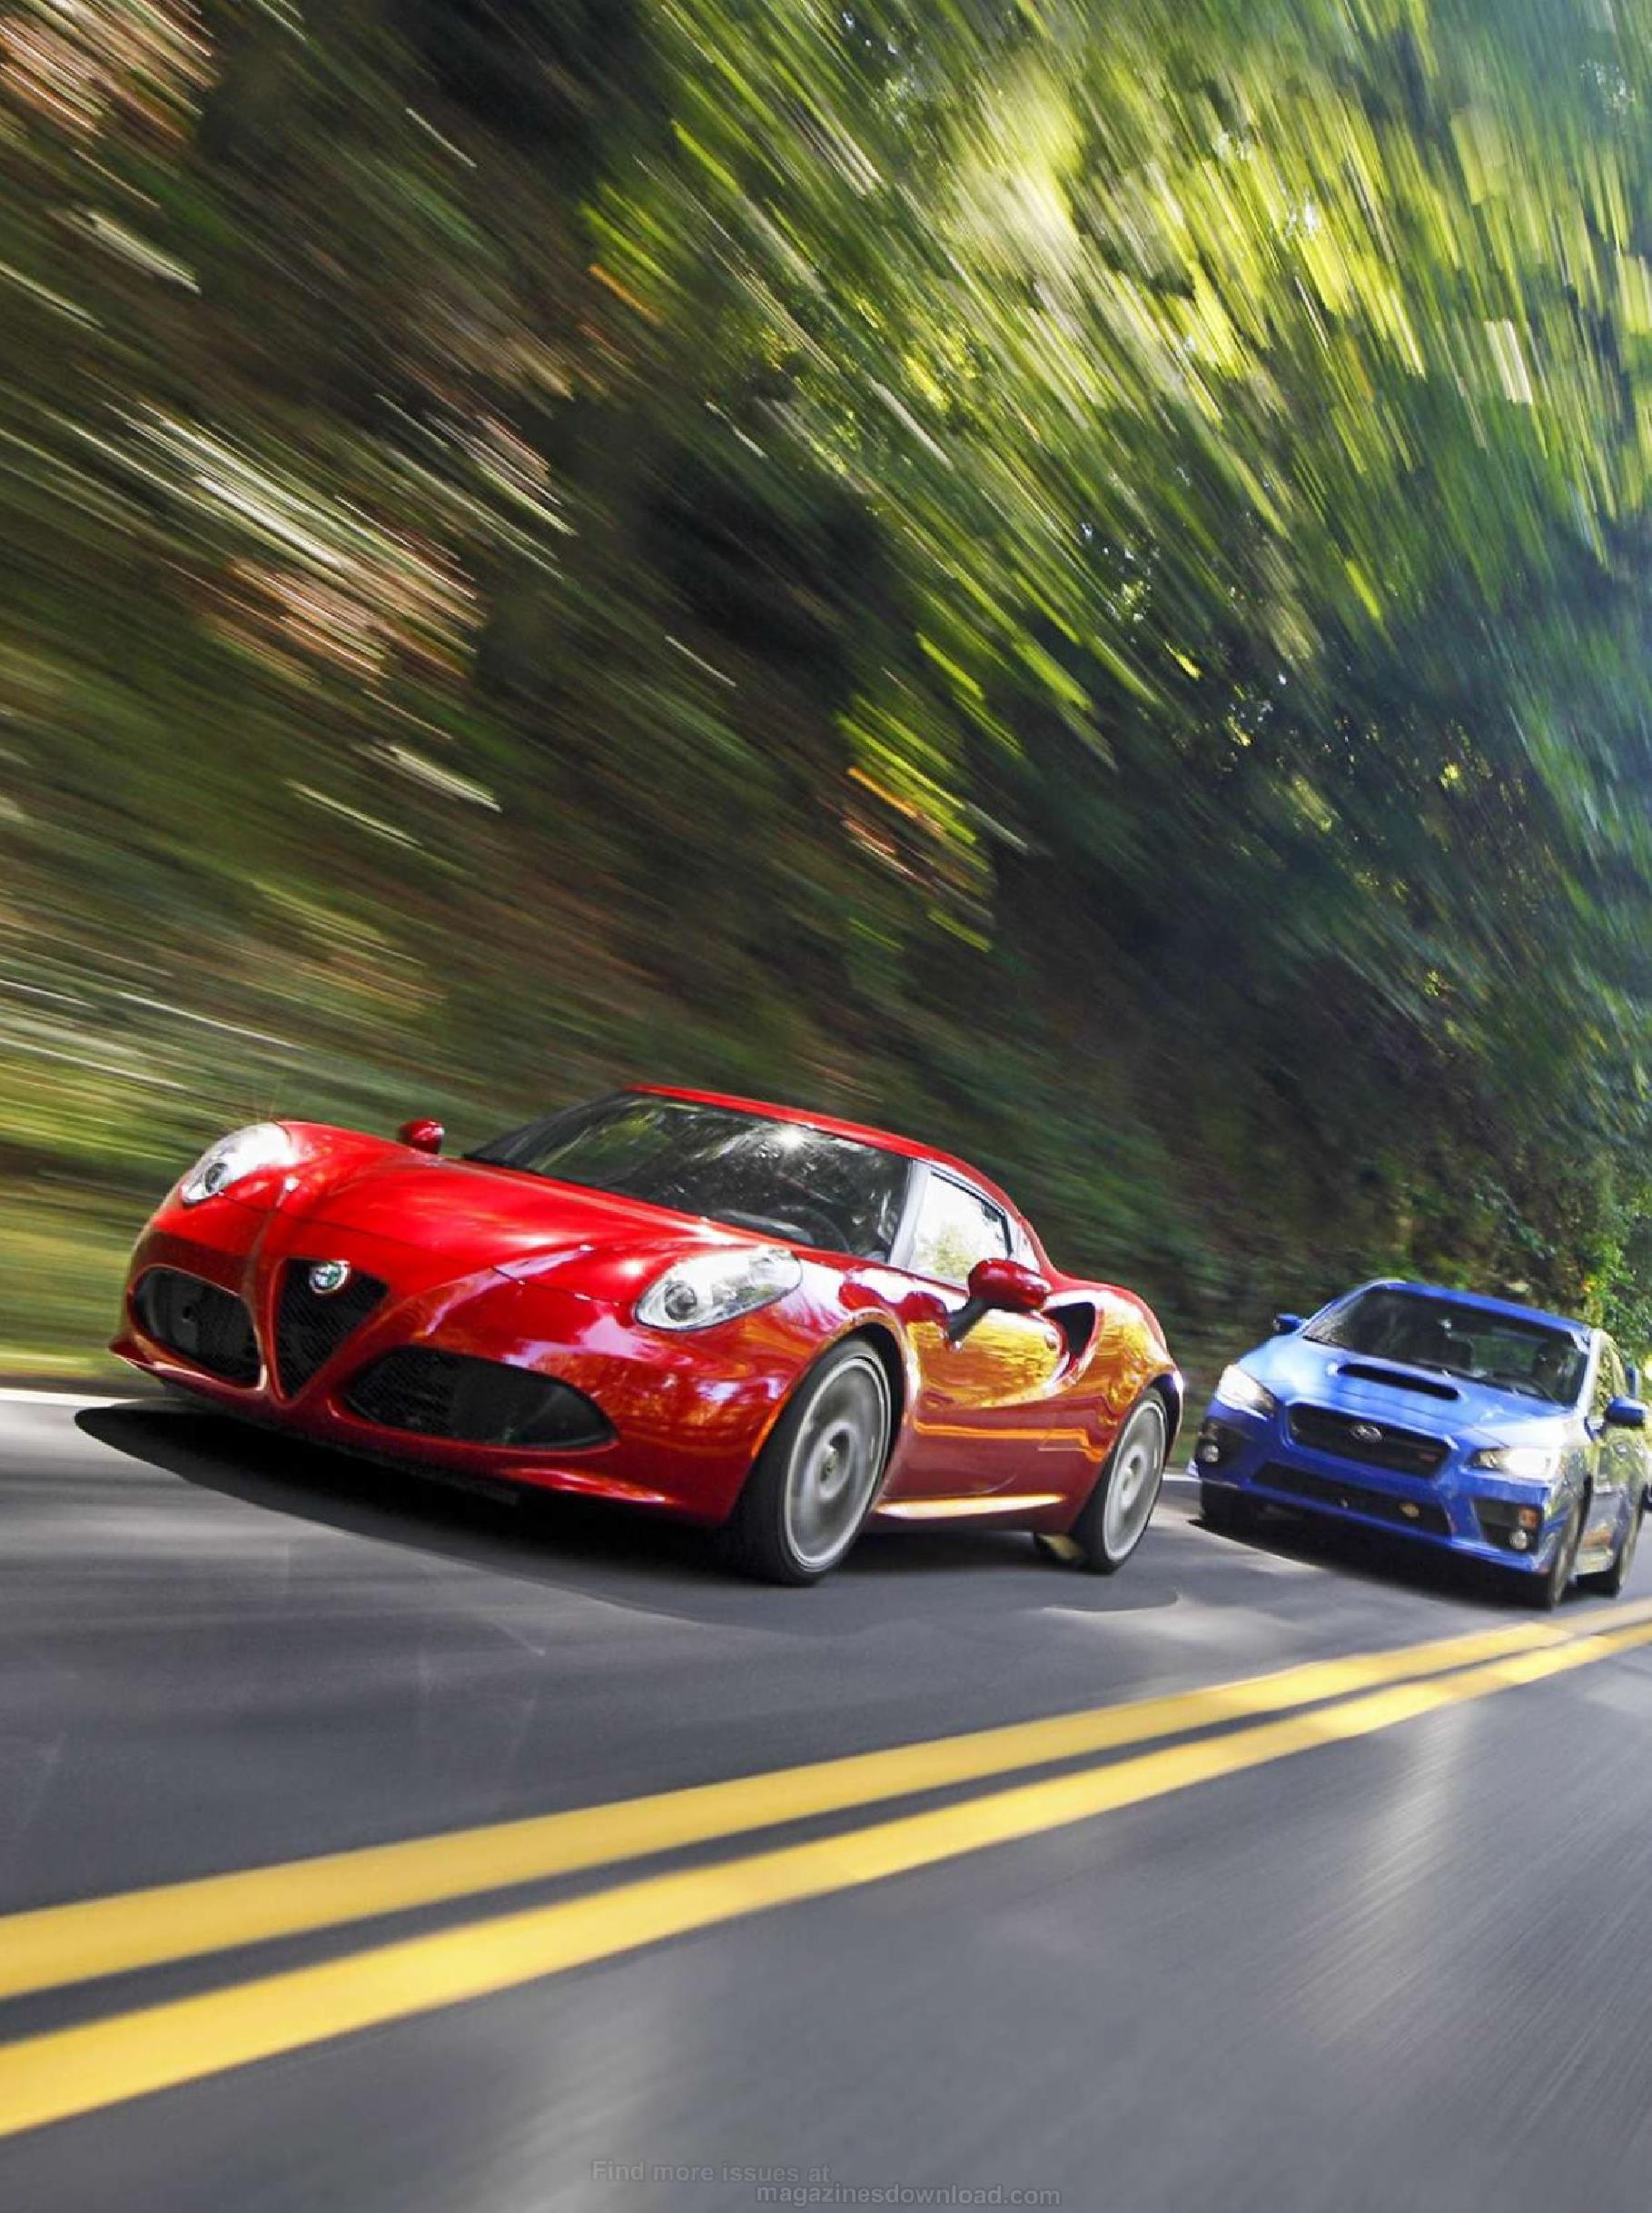 Wrx Vs Gti >> Porsche 991 GT3 vs Alfa-Romeo 4C, BMW M235, M3, Chevrolet ...